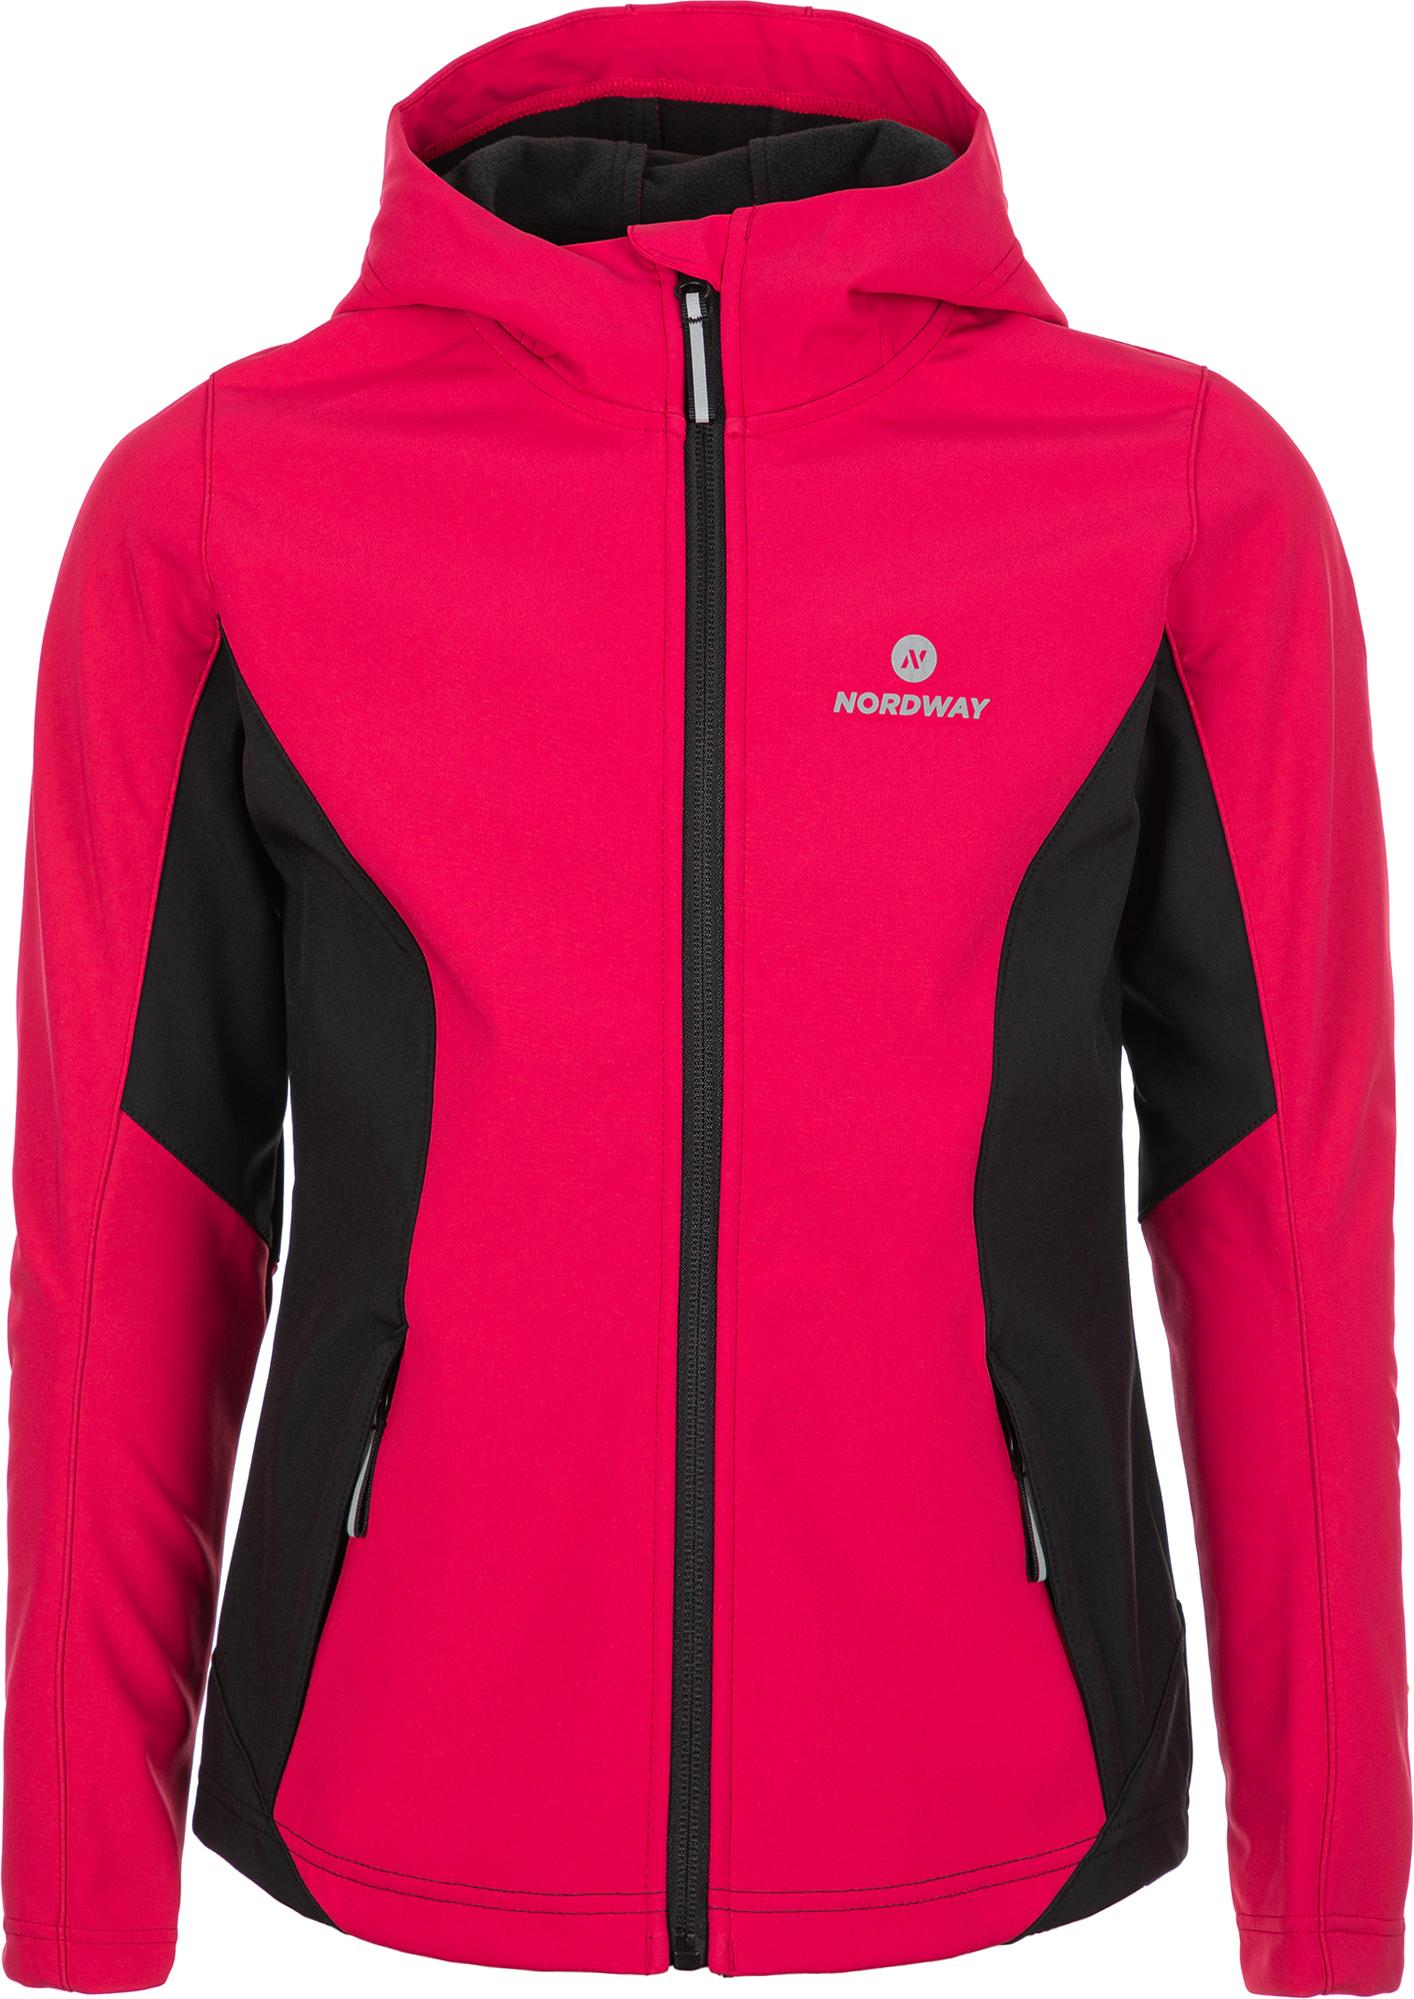 Nordway Куртка для девочек Nordway, размер 164 nordway клюшка хоккейная детская nordway размер r